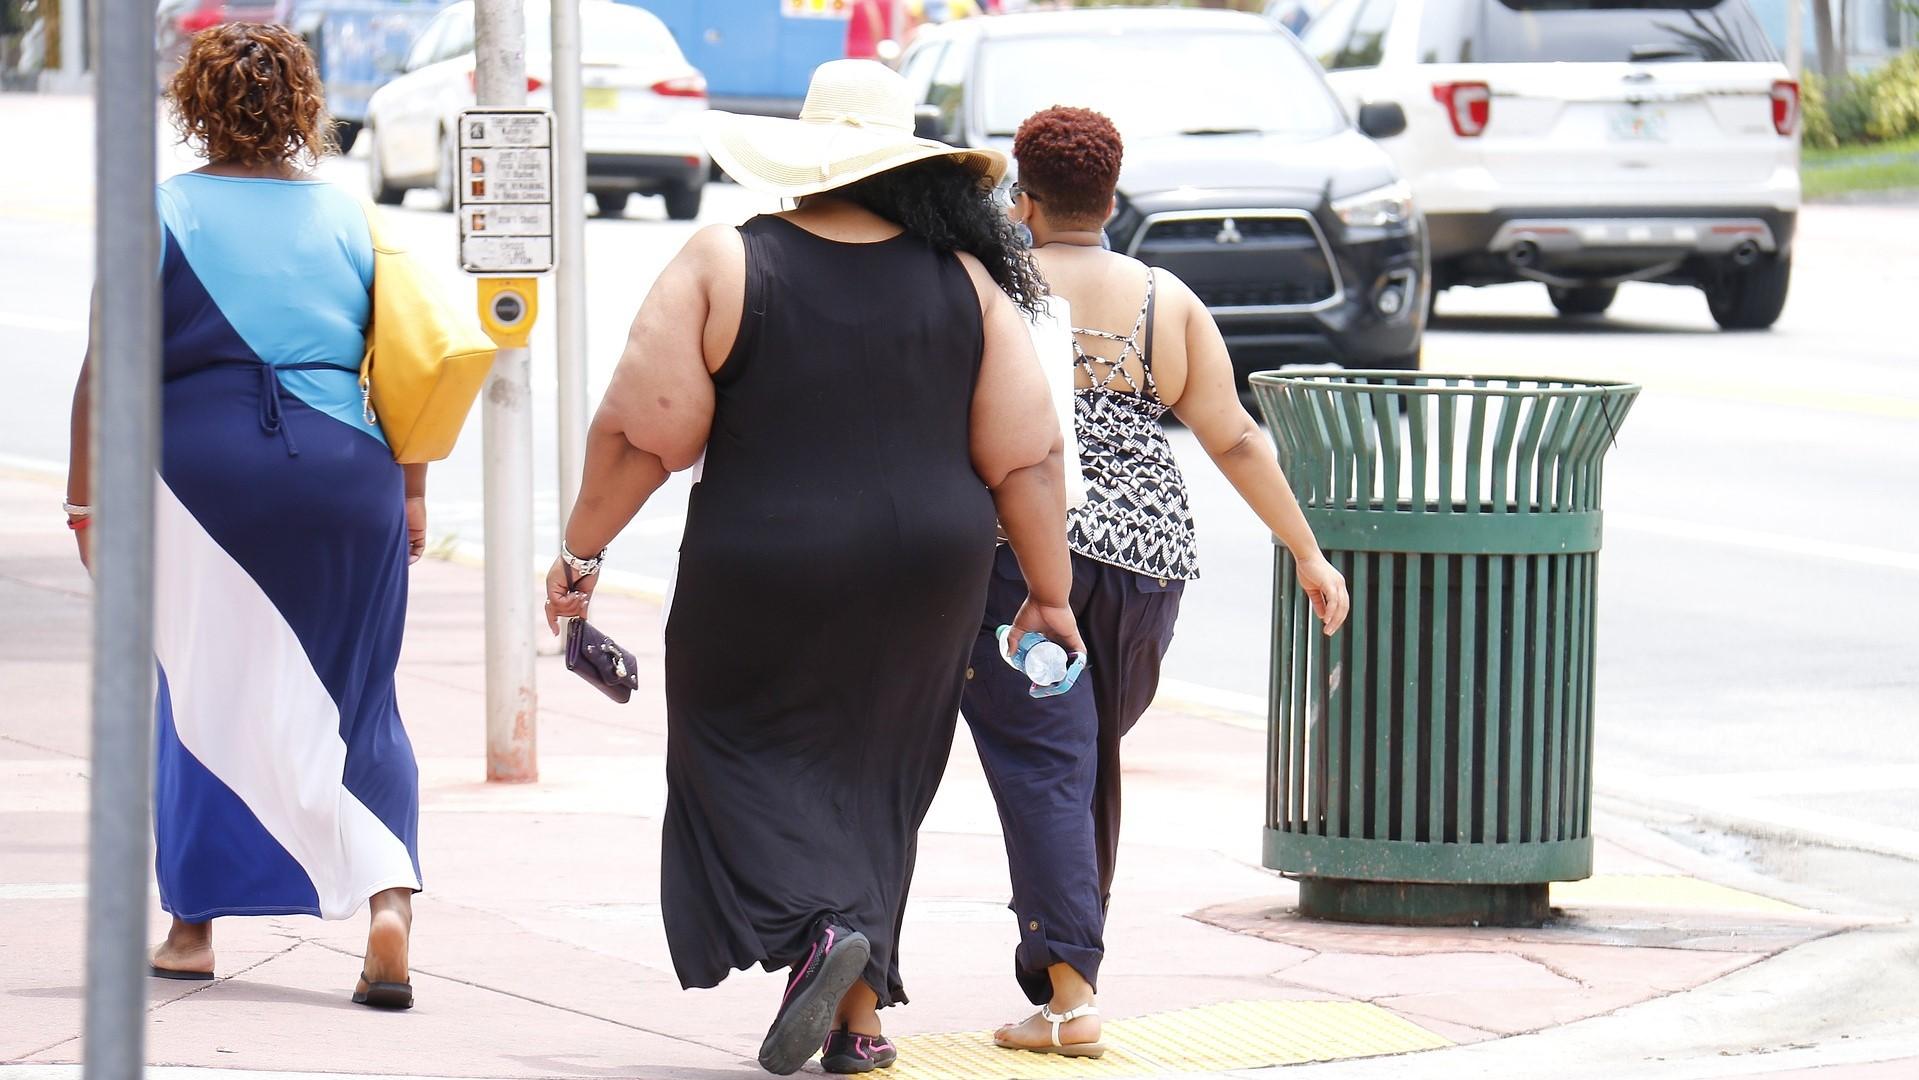 Obesity Statistics - Featured Image